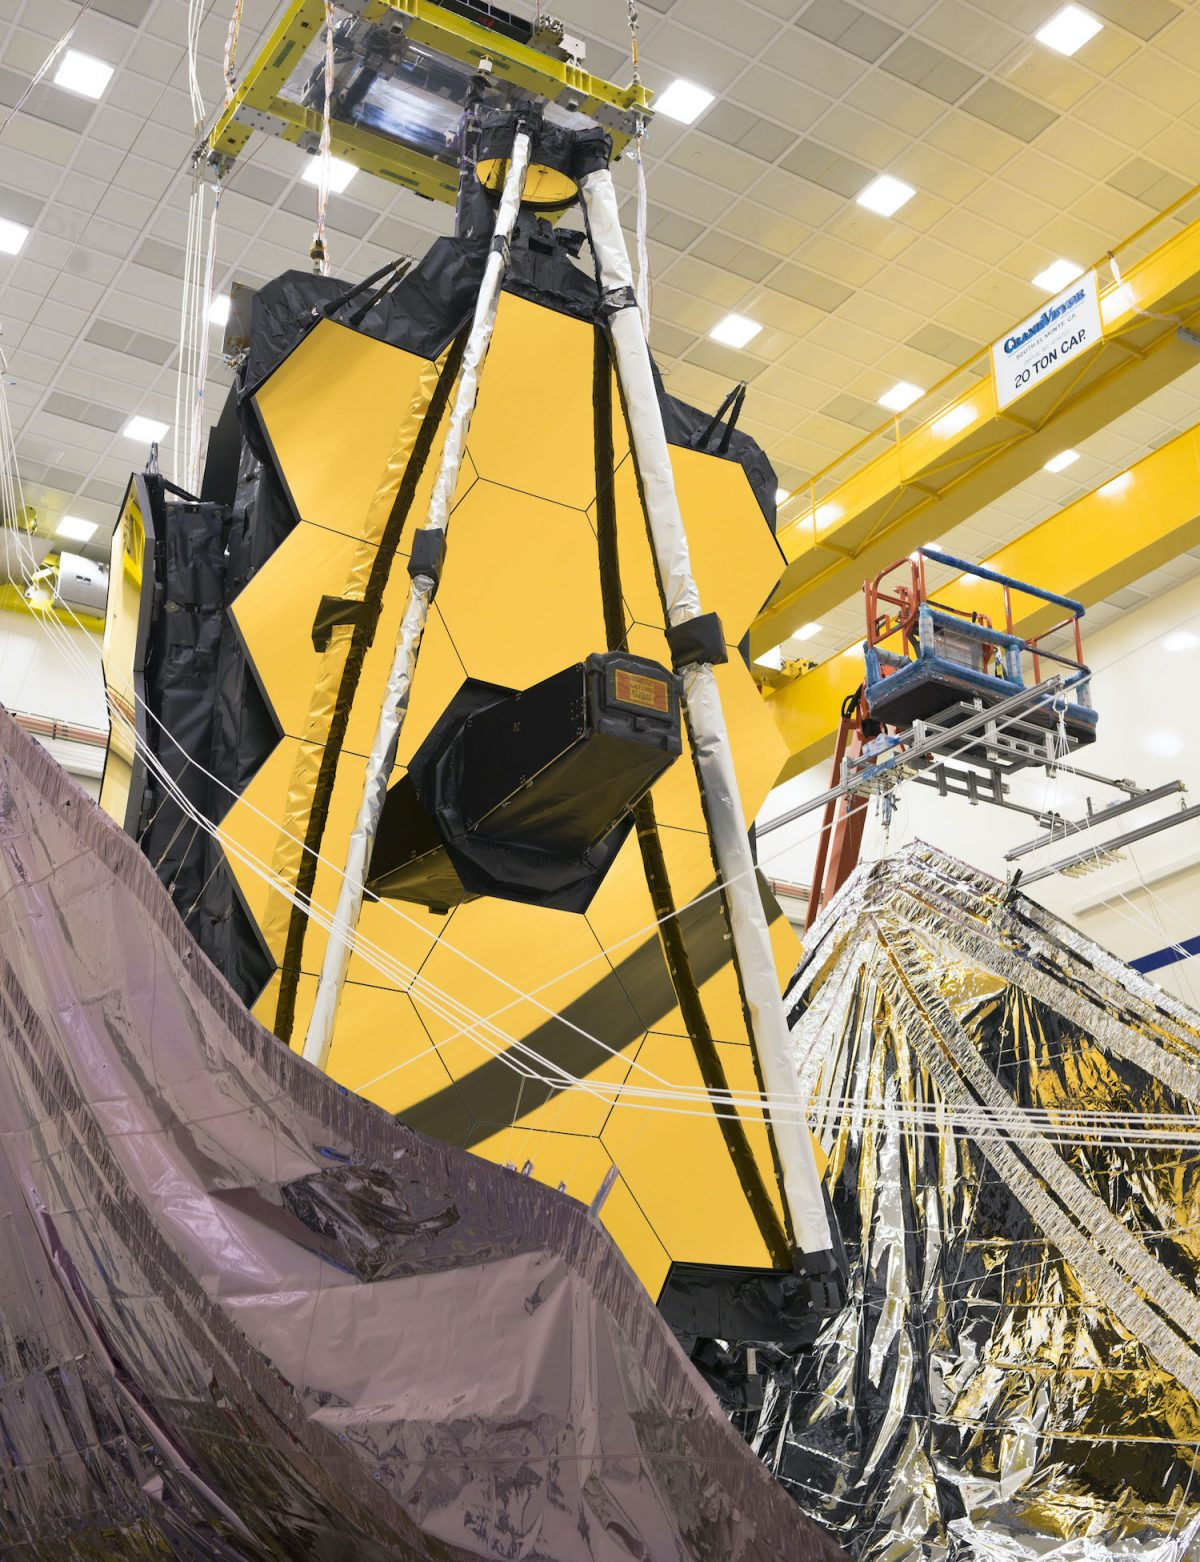 NASA successful test the folding of the Webb Telescope Sunshield